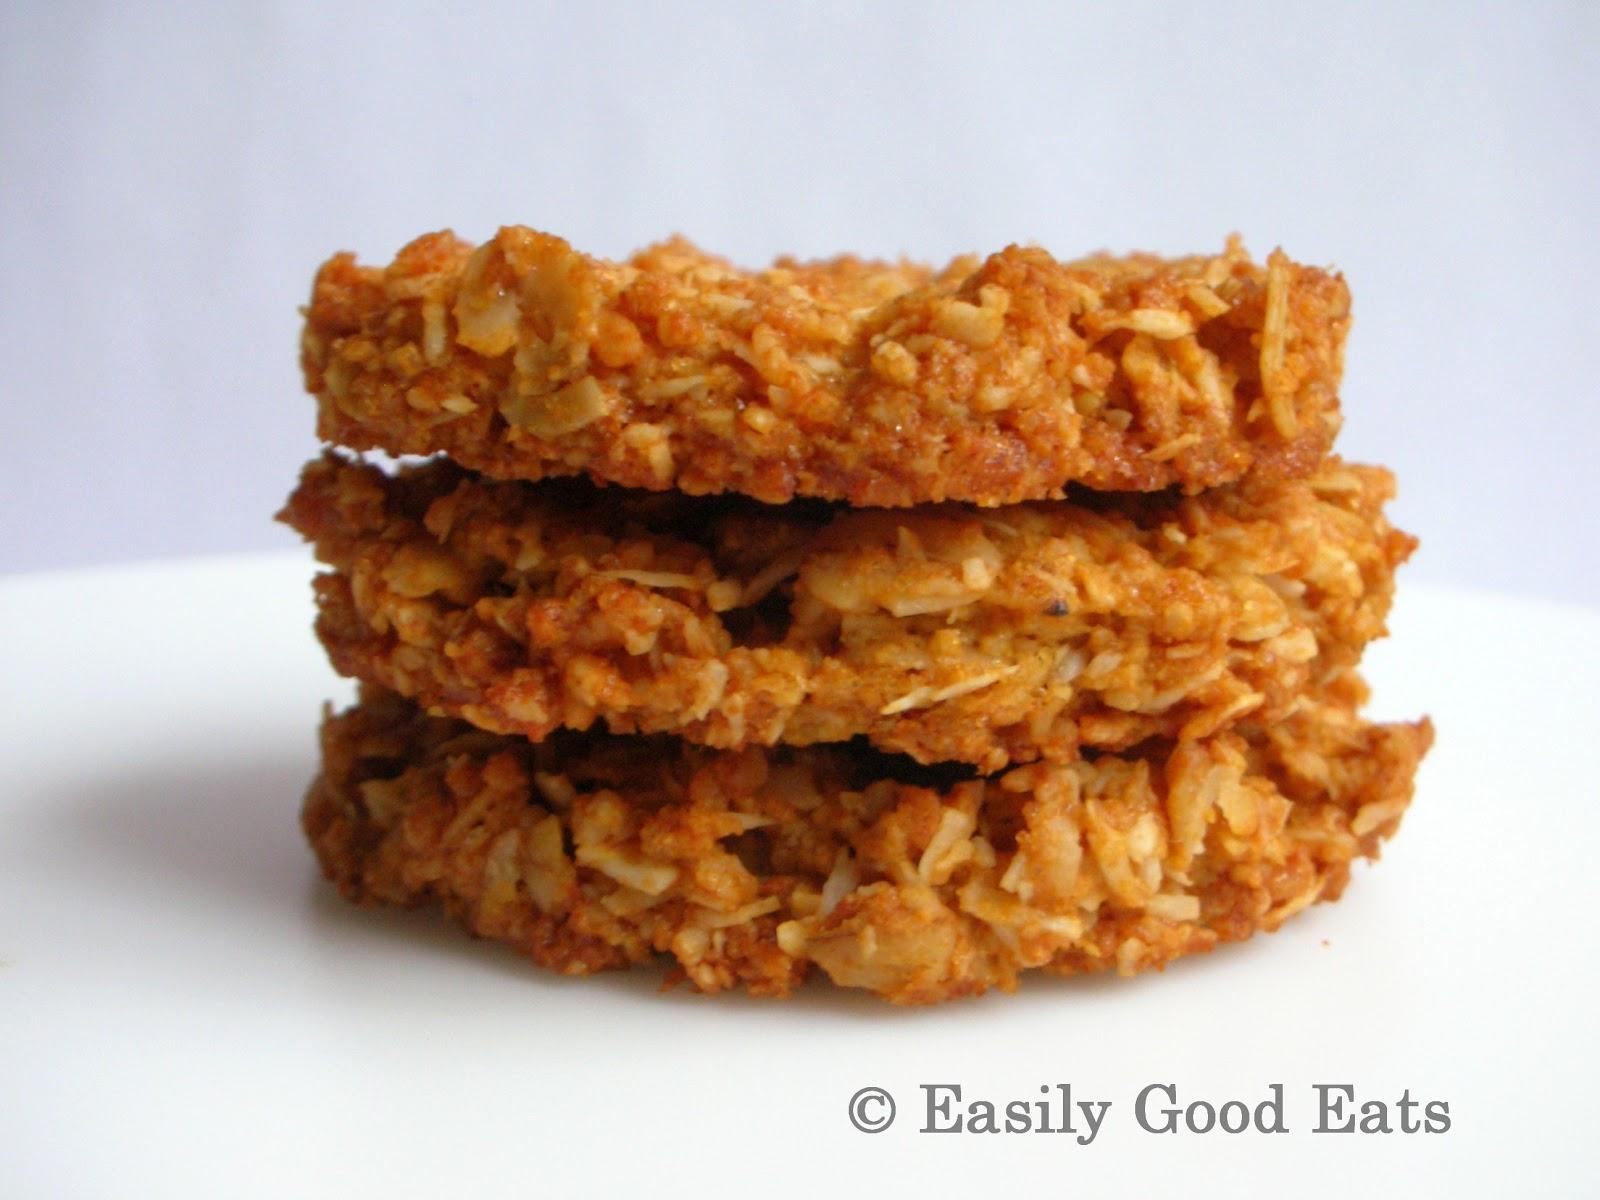 Easily Good Eats: Gluten Free Coconut Oat (ANZAC) Cookies ...